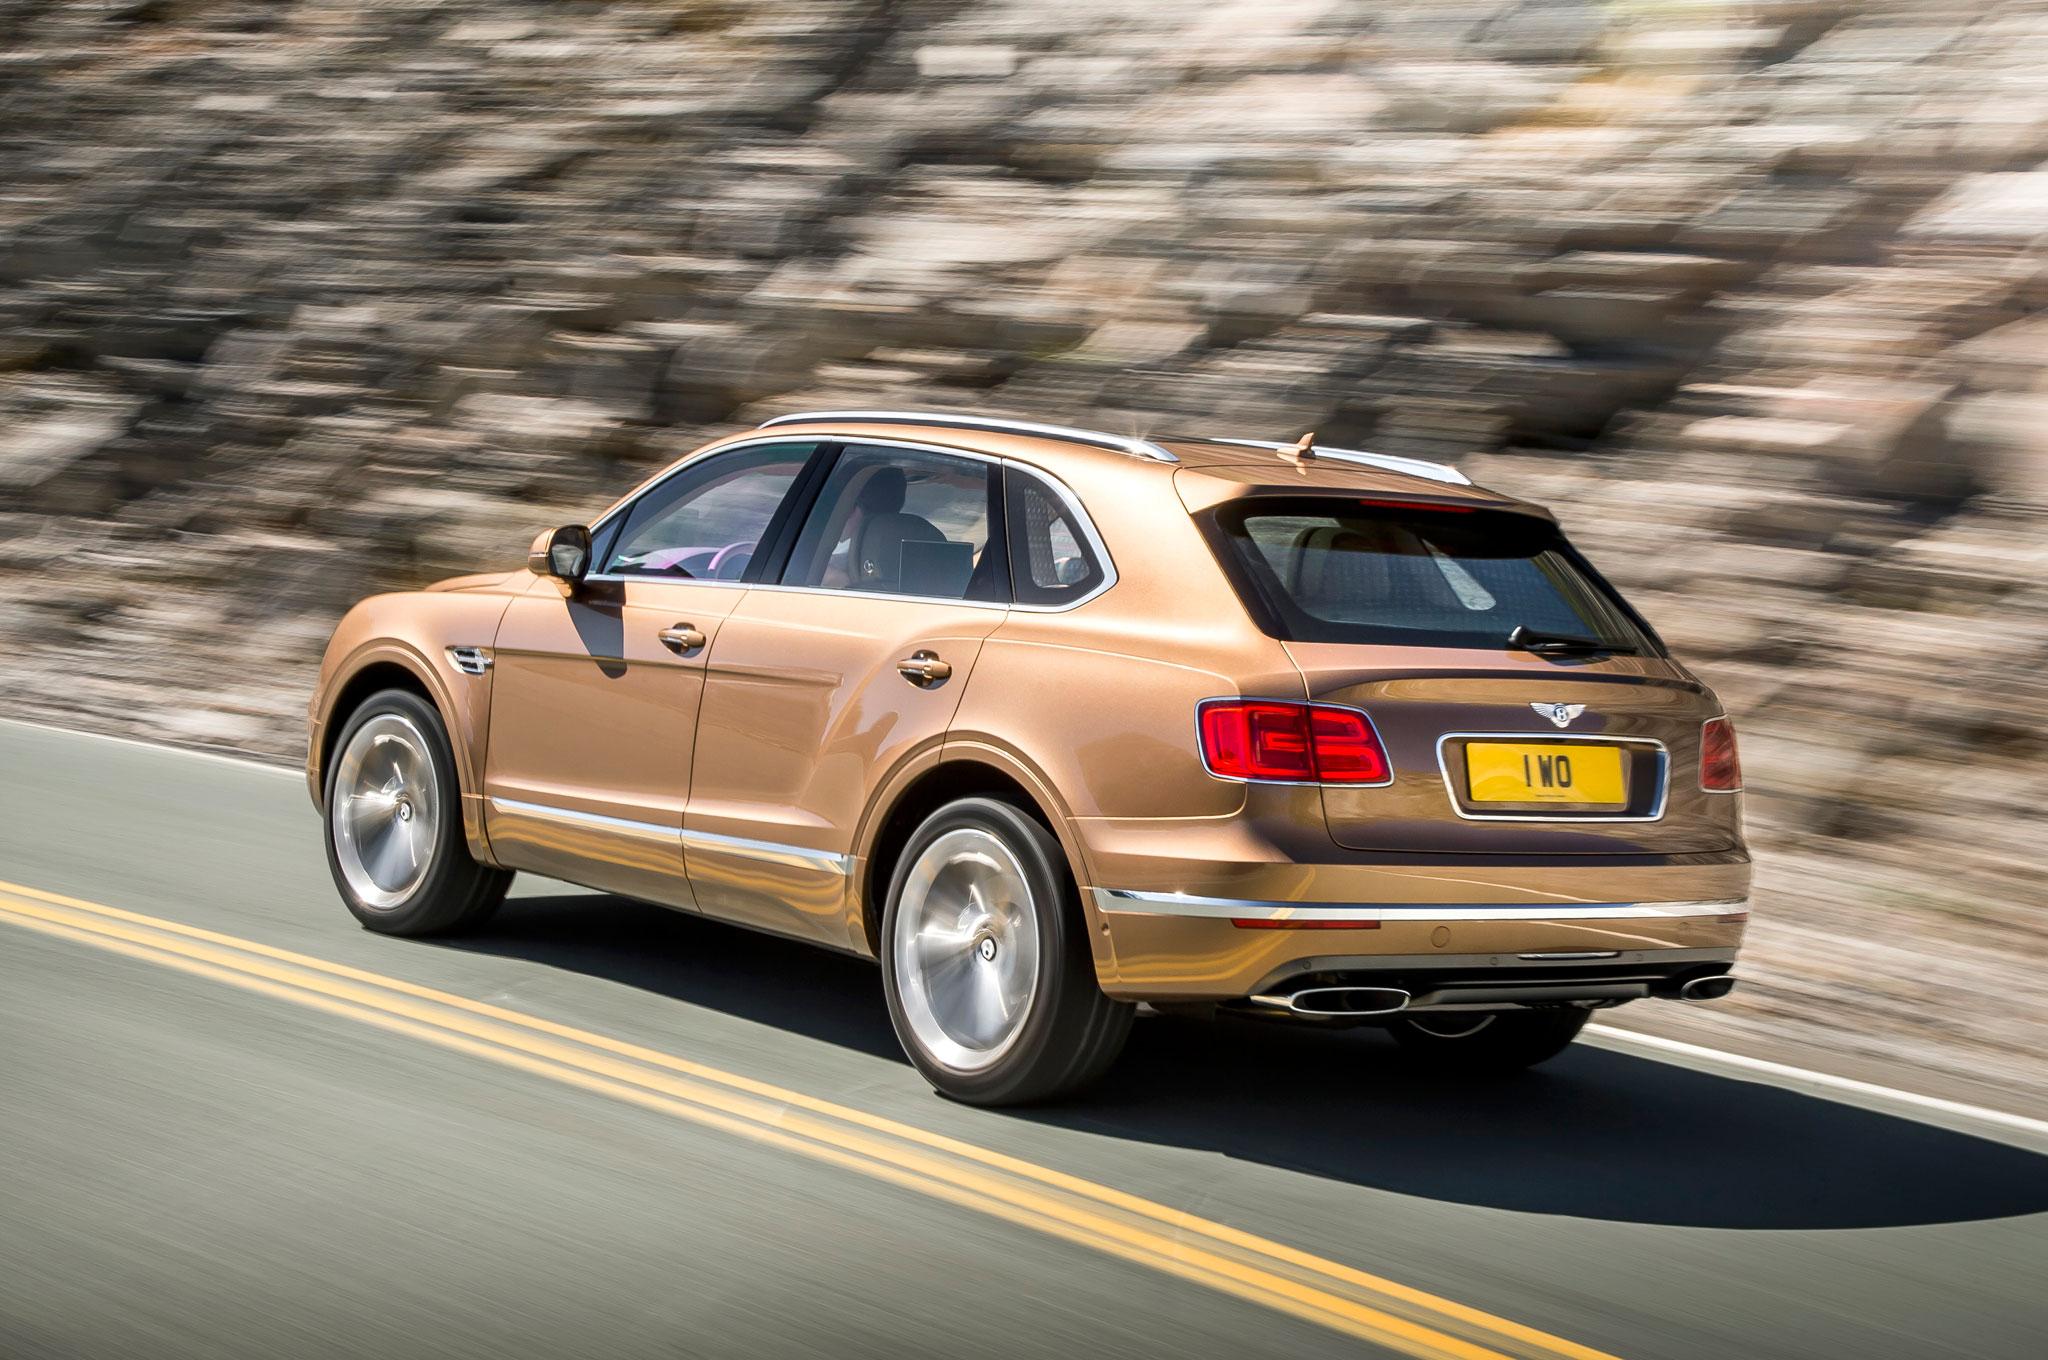 2017 Bentley Bentayga First Drive Review | Automobile Magazine